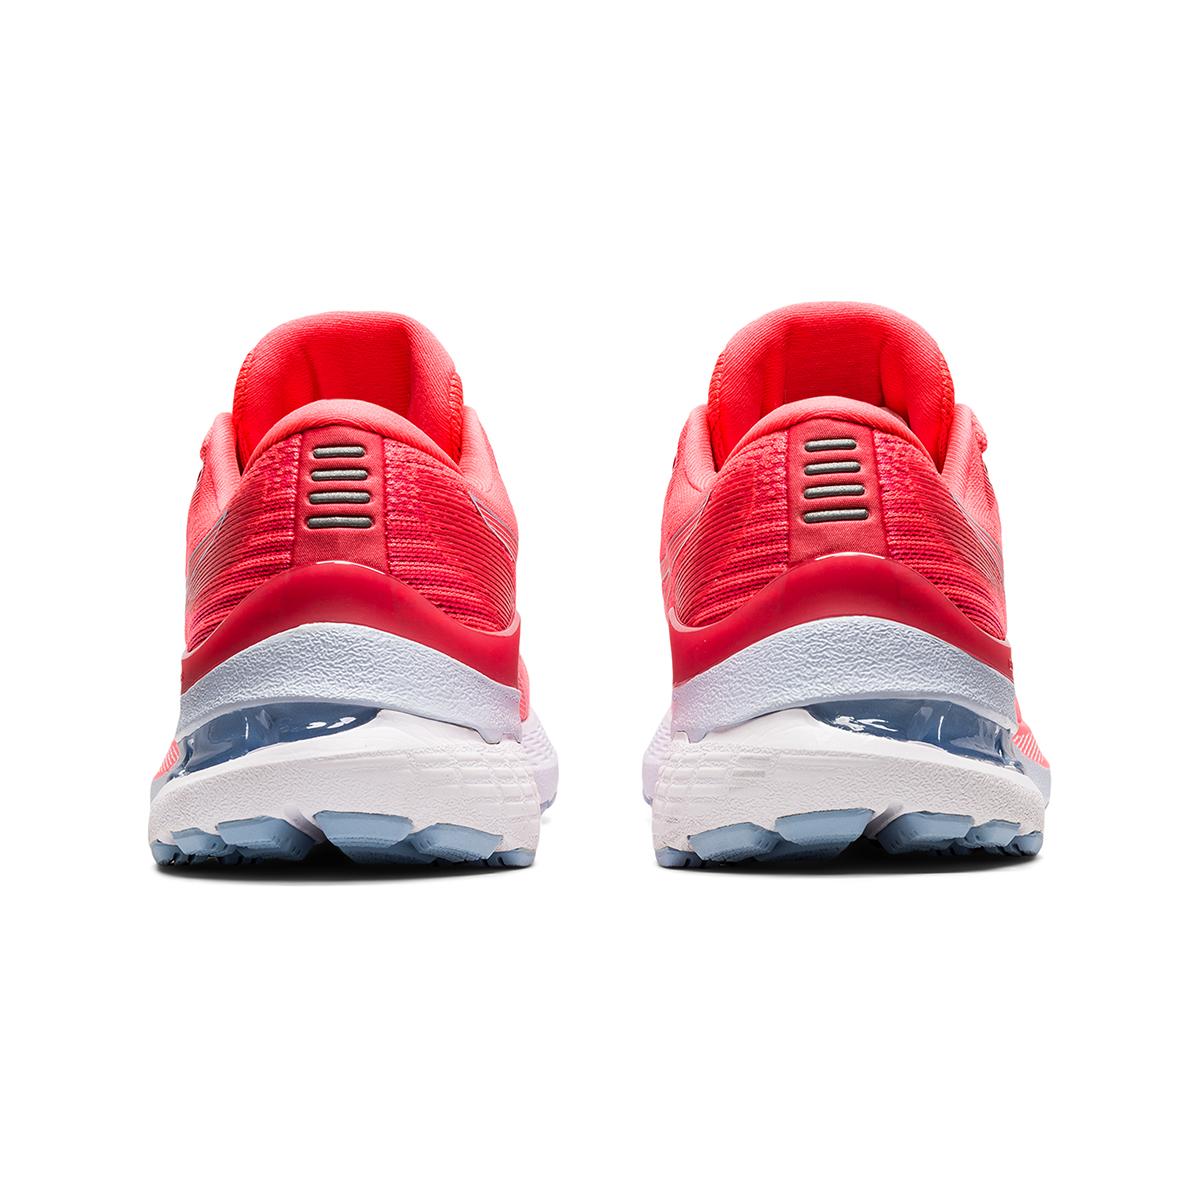 Women's Asics Gel-Kayano 28 Running Shoe - Color: Blazing Coral - Size: 5 - Width: Regular, Blazing Coral, large, image 7